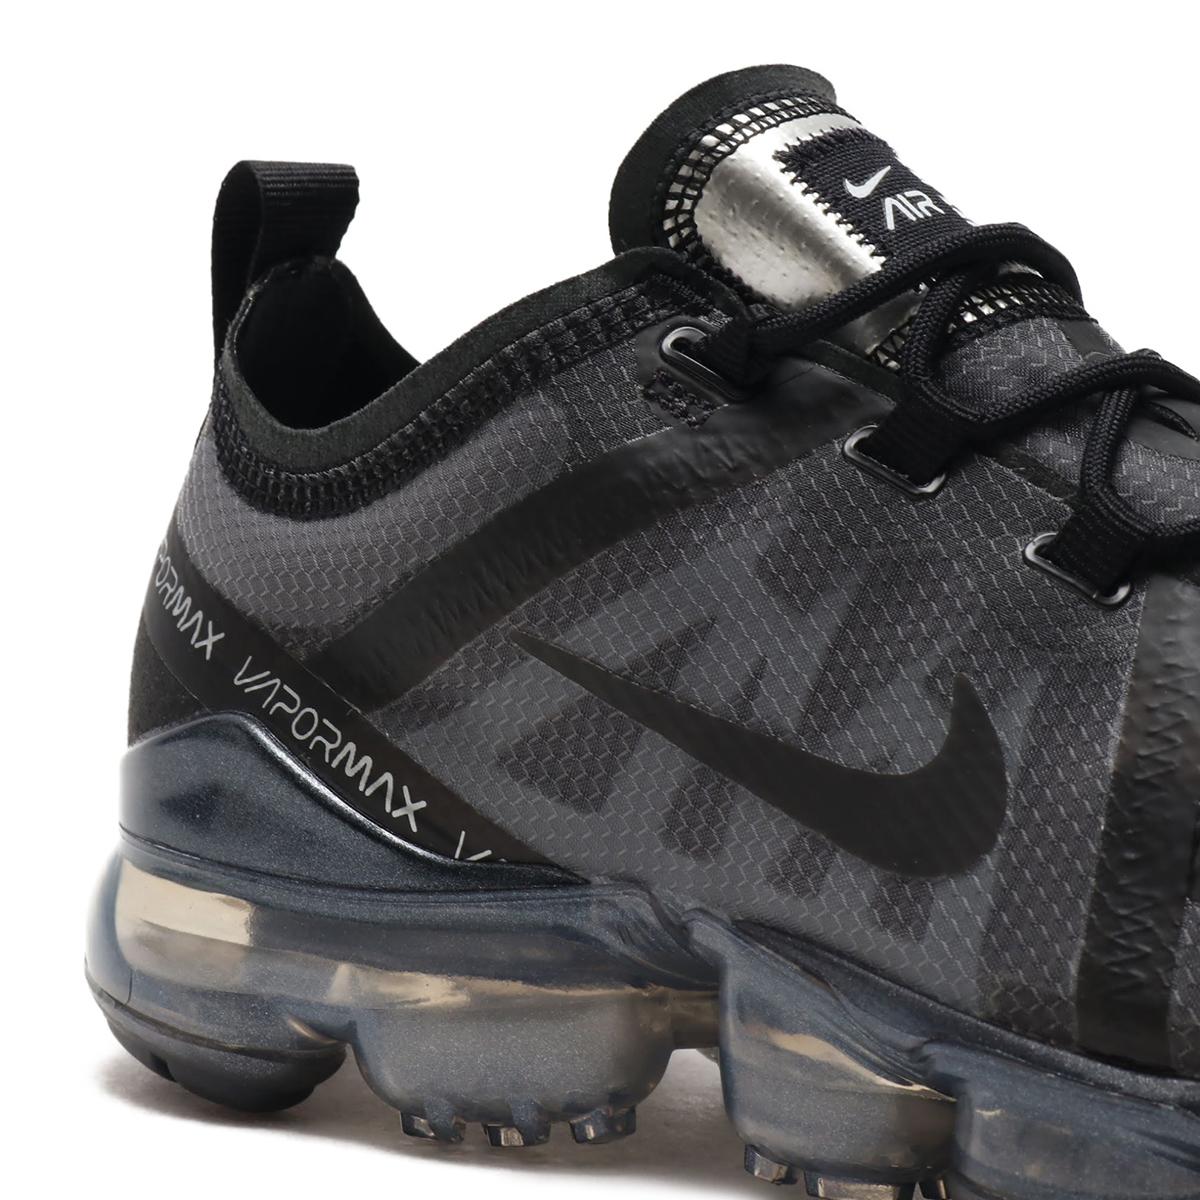 863c9f23e7cc NIKE WMNS AIR VAPORMAX 2019 (Nike women air vapor max 2019)  BLACK BLACK-BLACK 19SP-S